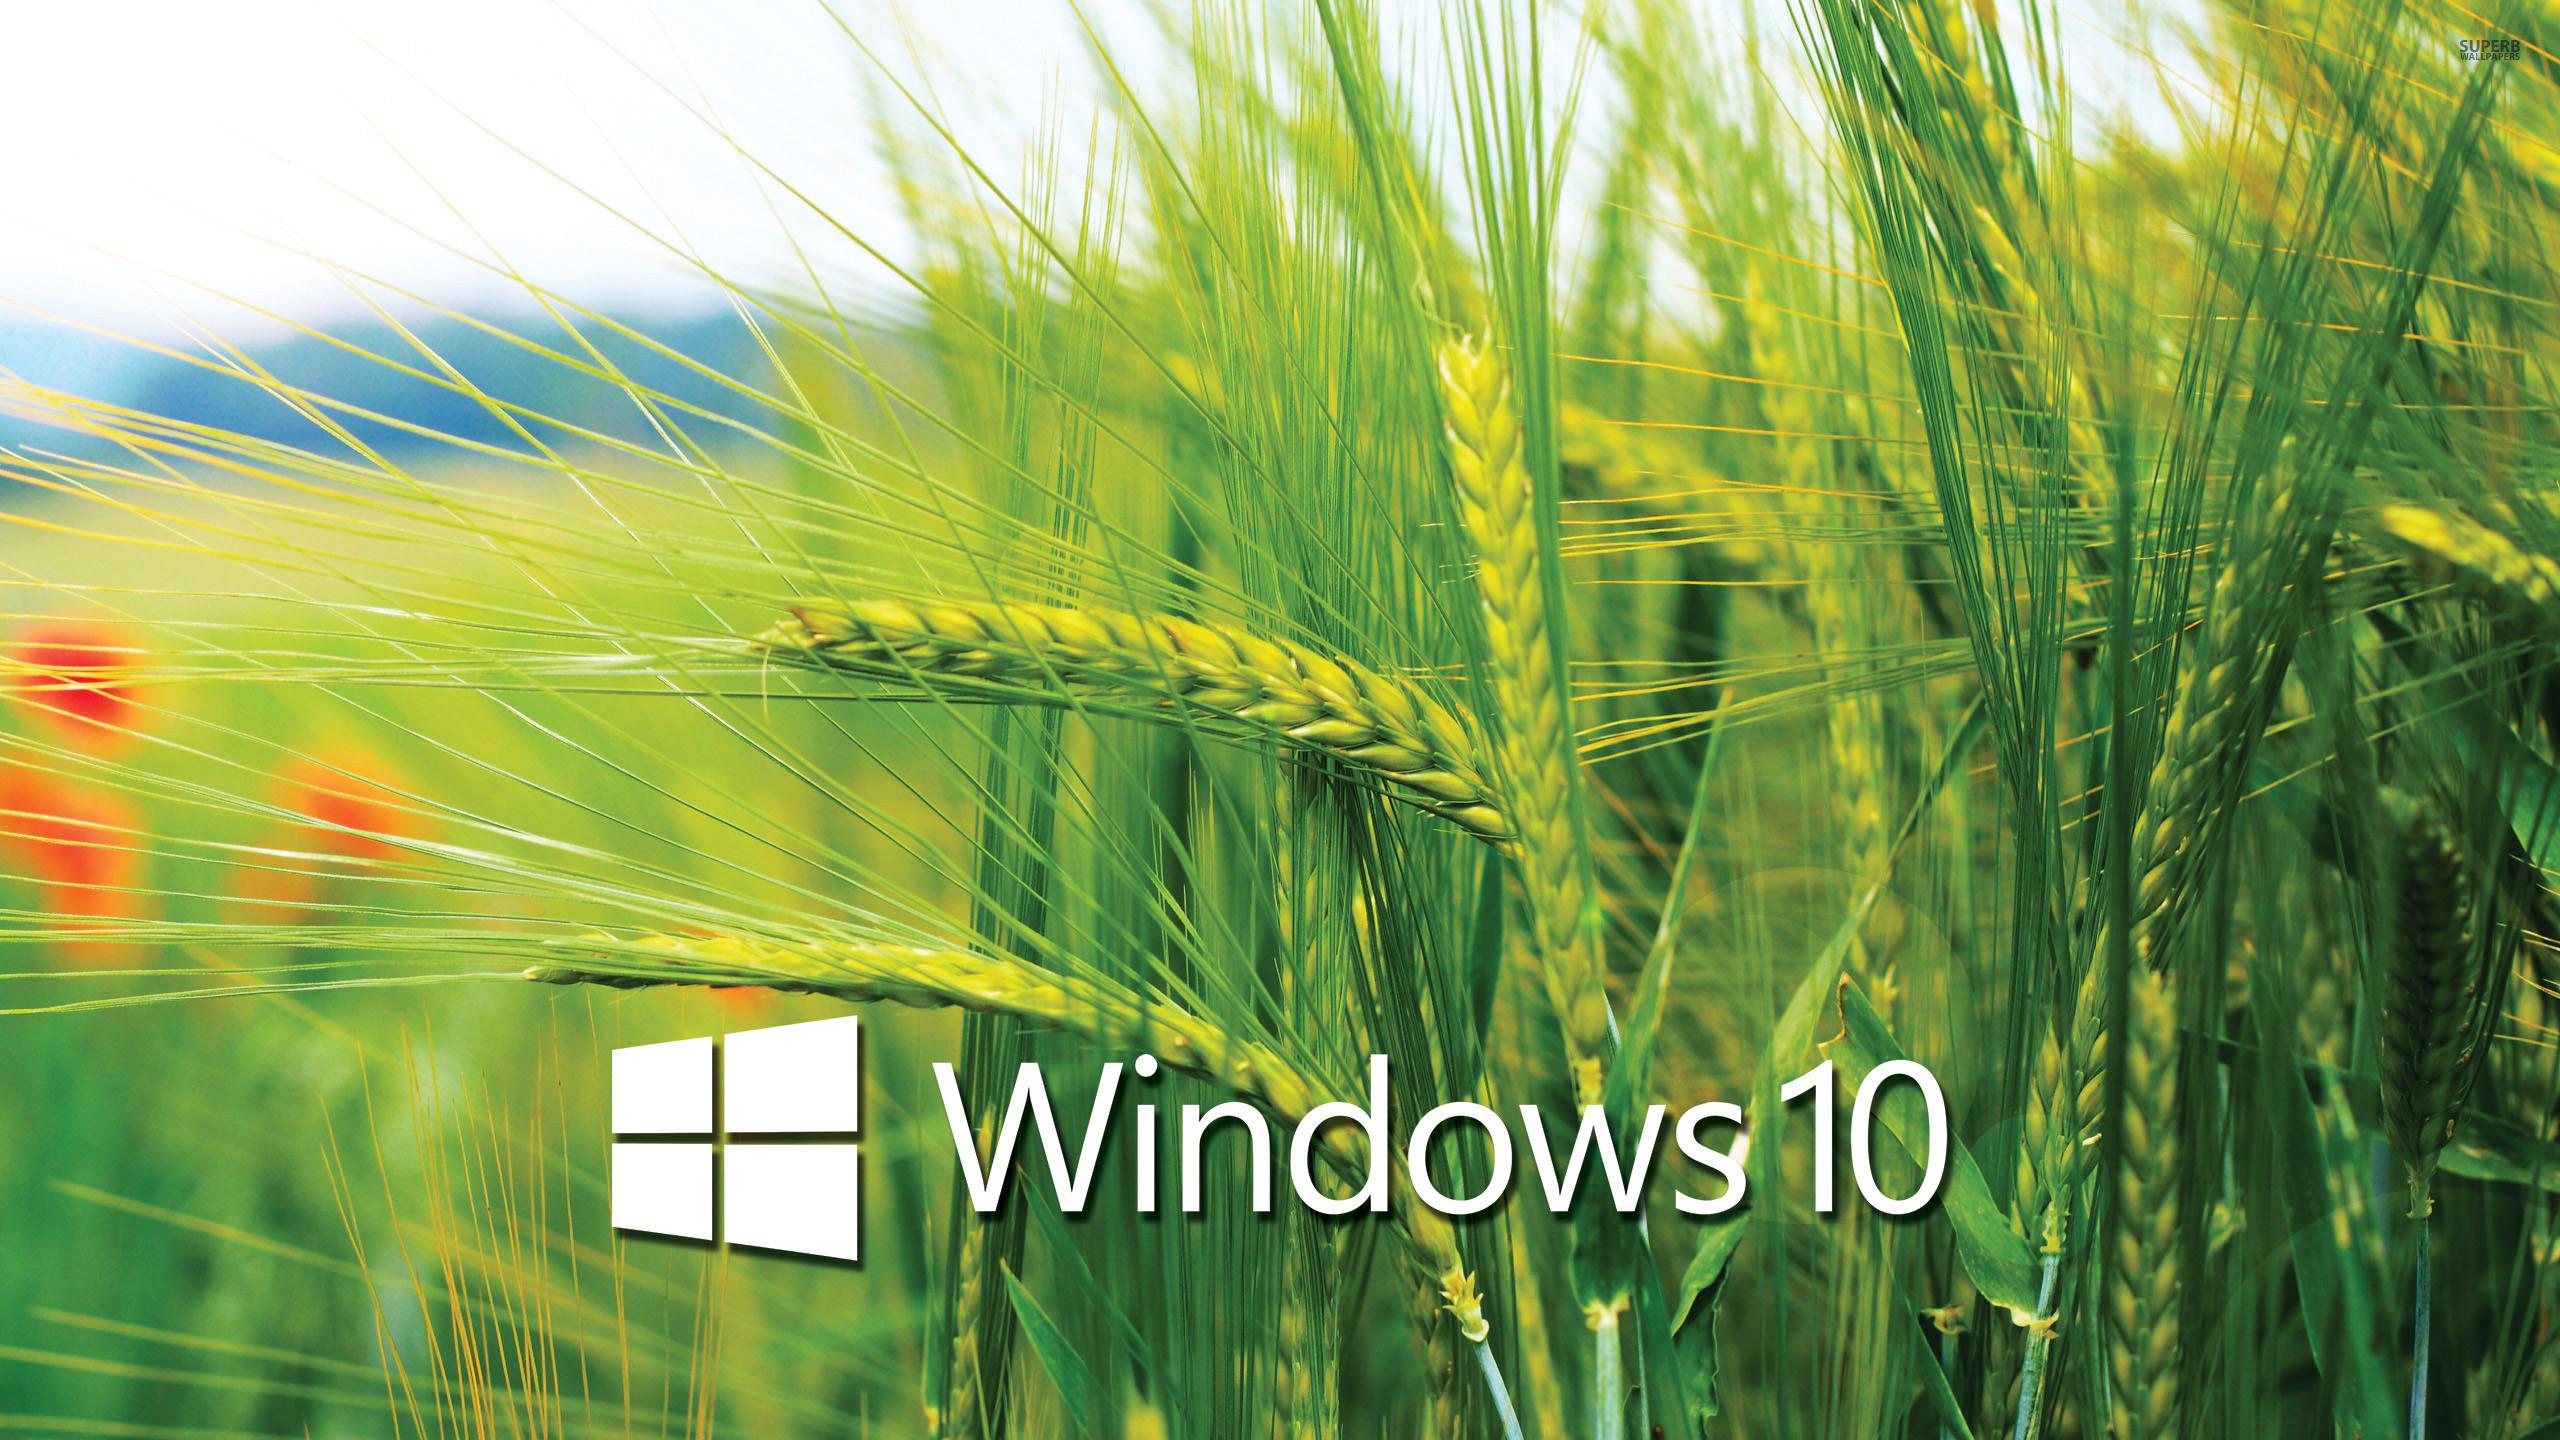 Windows 10 Transparent Wallpapers.